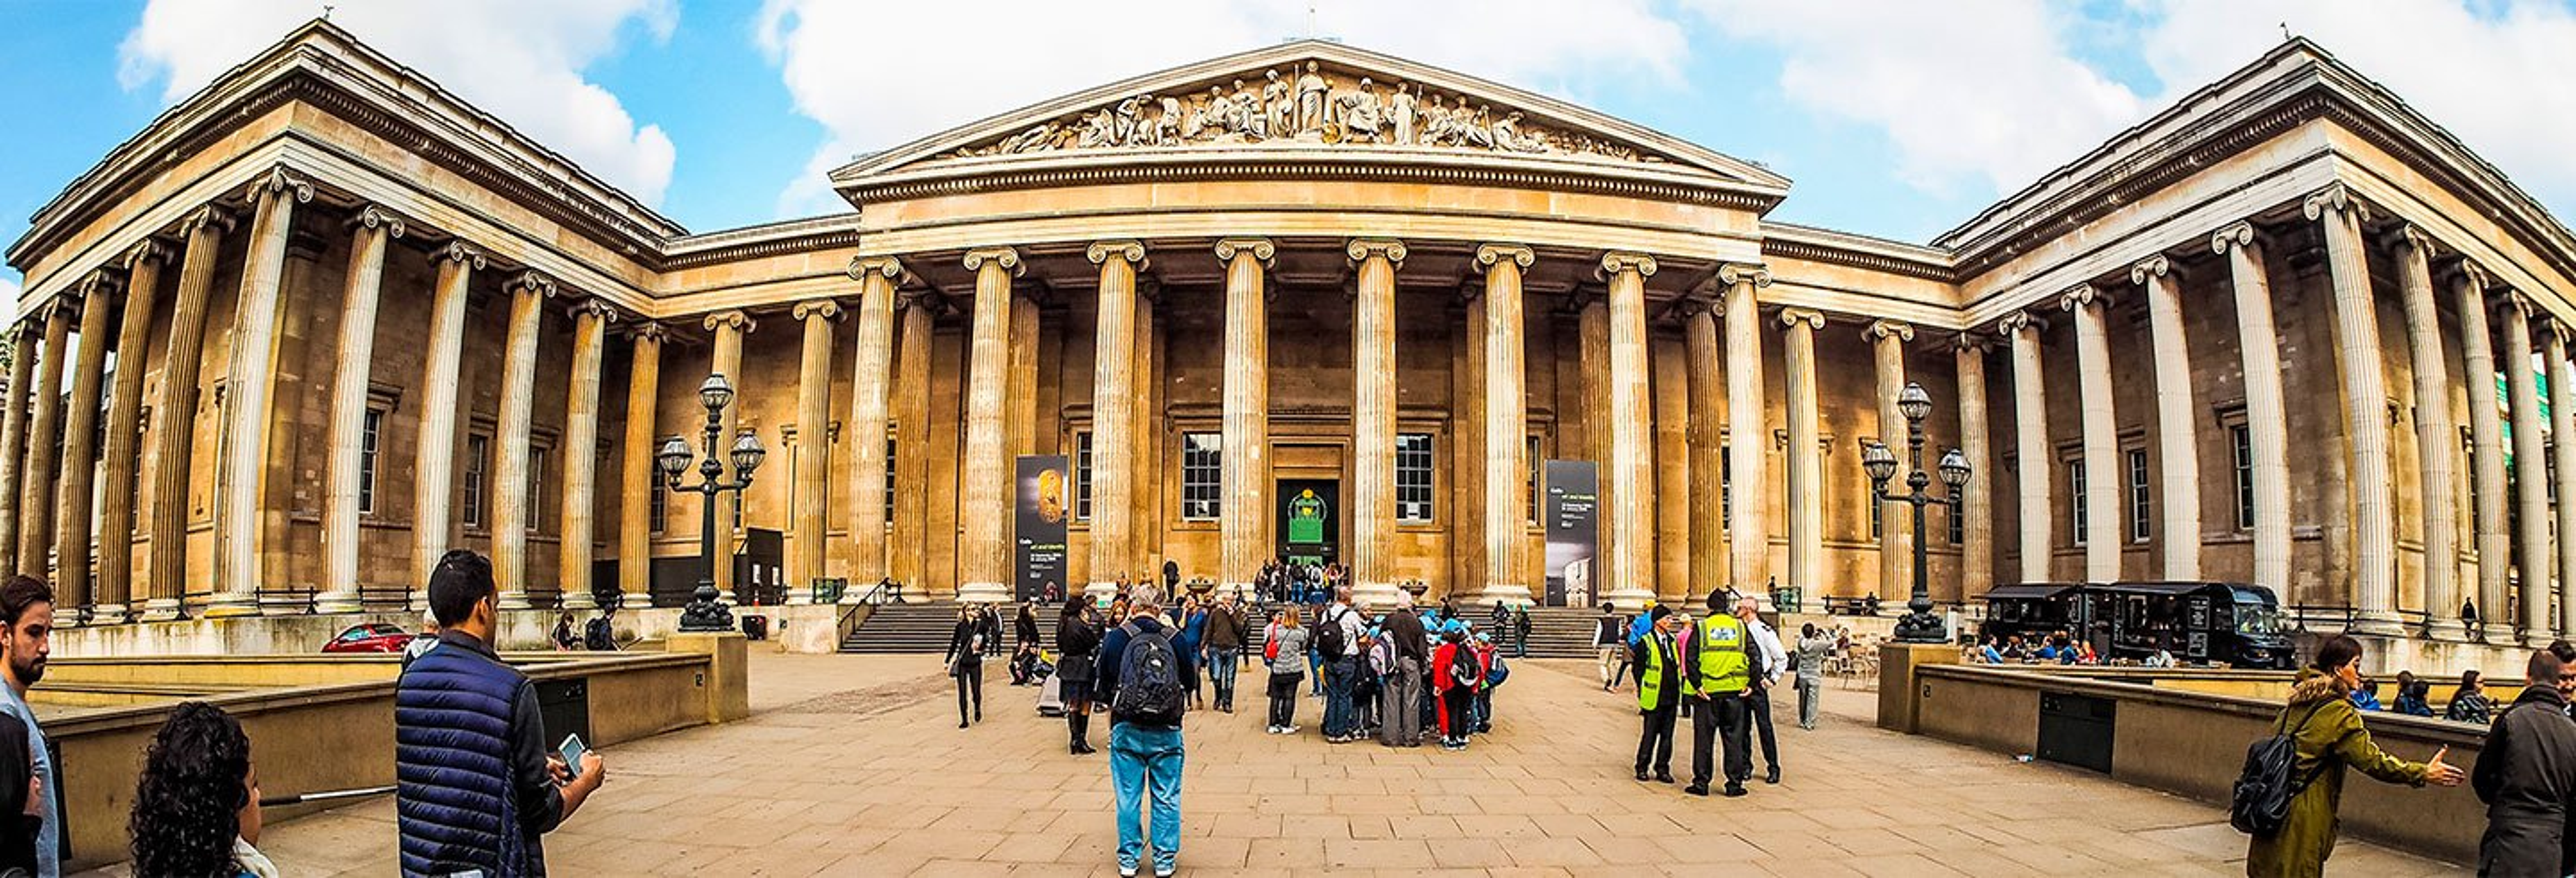 Visita guiada pelo British Museum